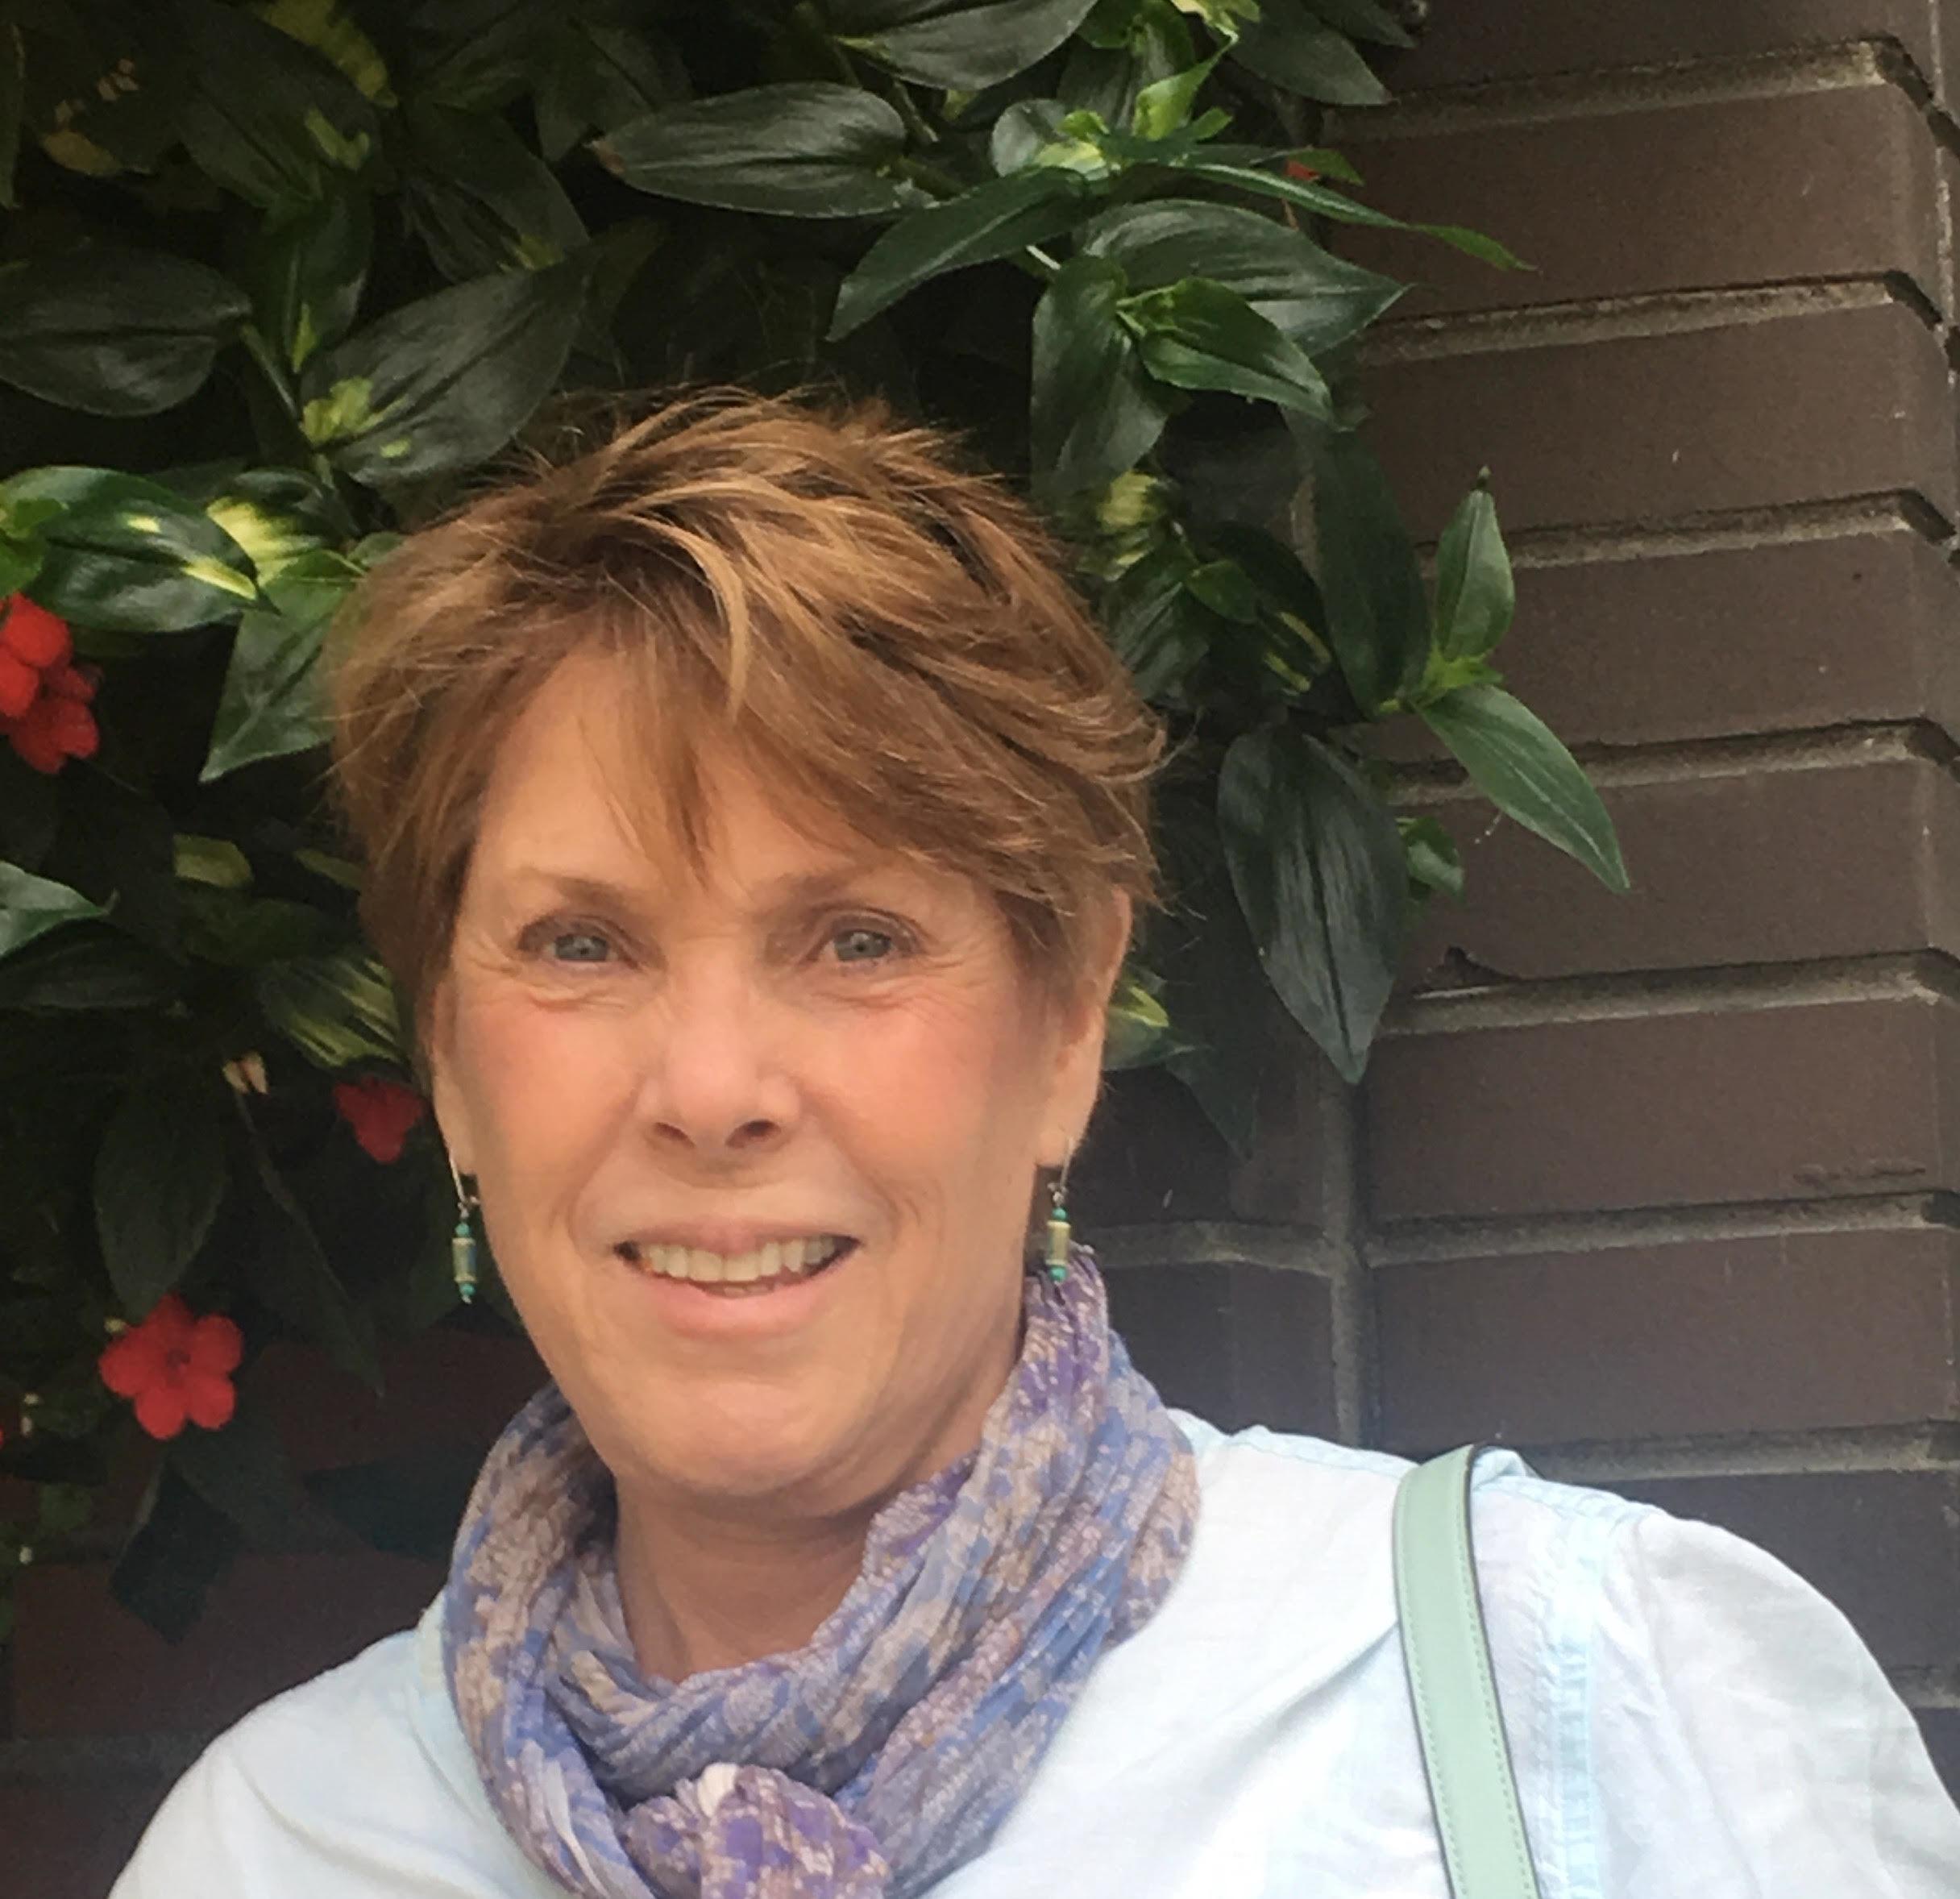 Beth Ahlstrom - NPCA Advocacy Chair